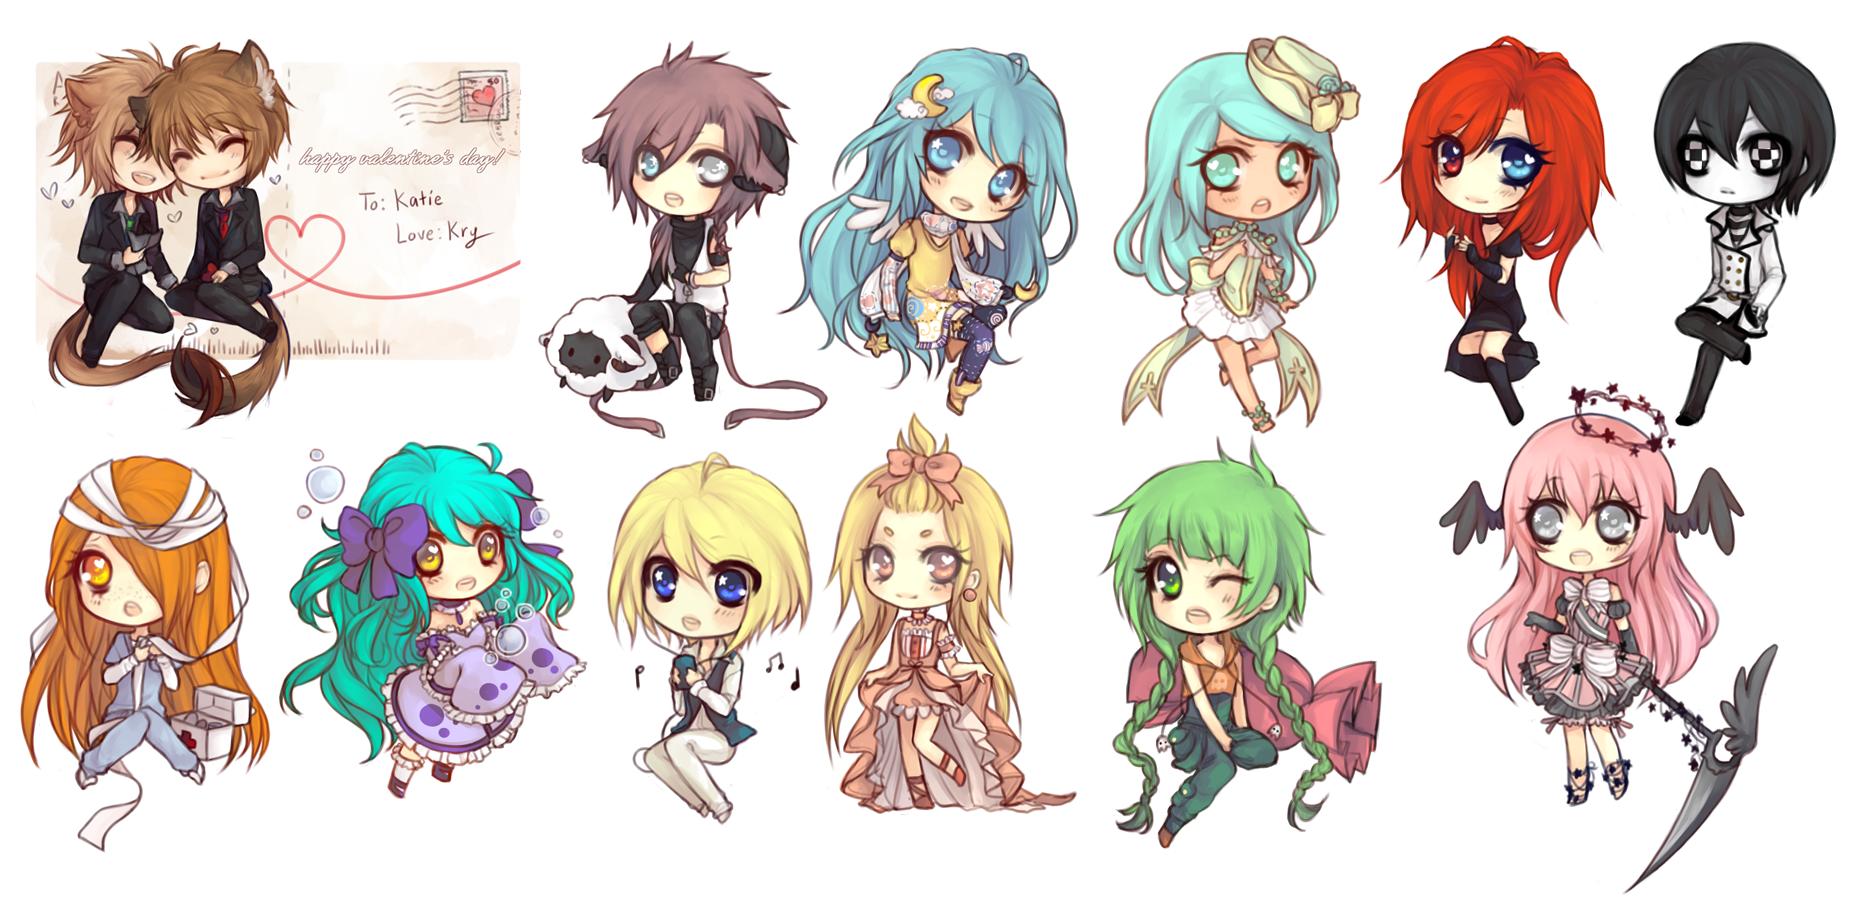 Anime Chibi Girl Friends | newhairstylesformen2014.com